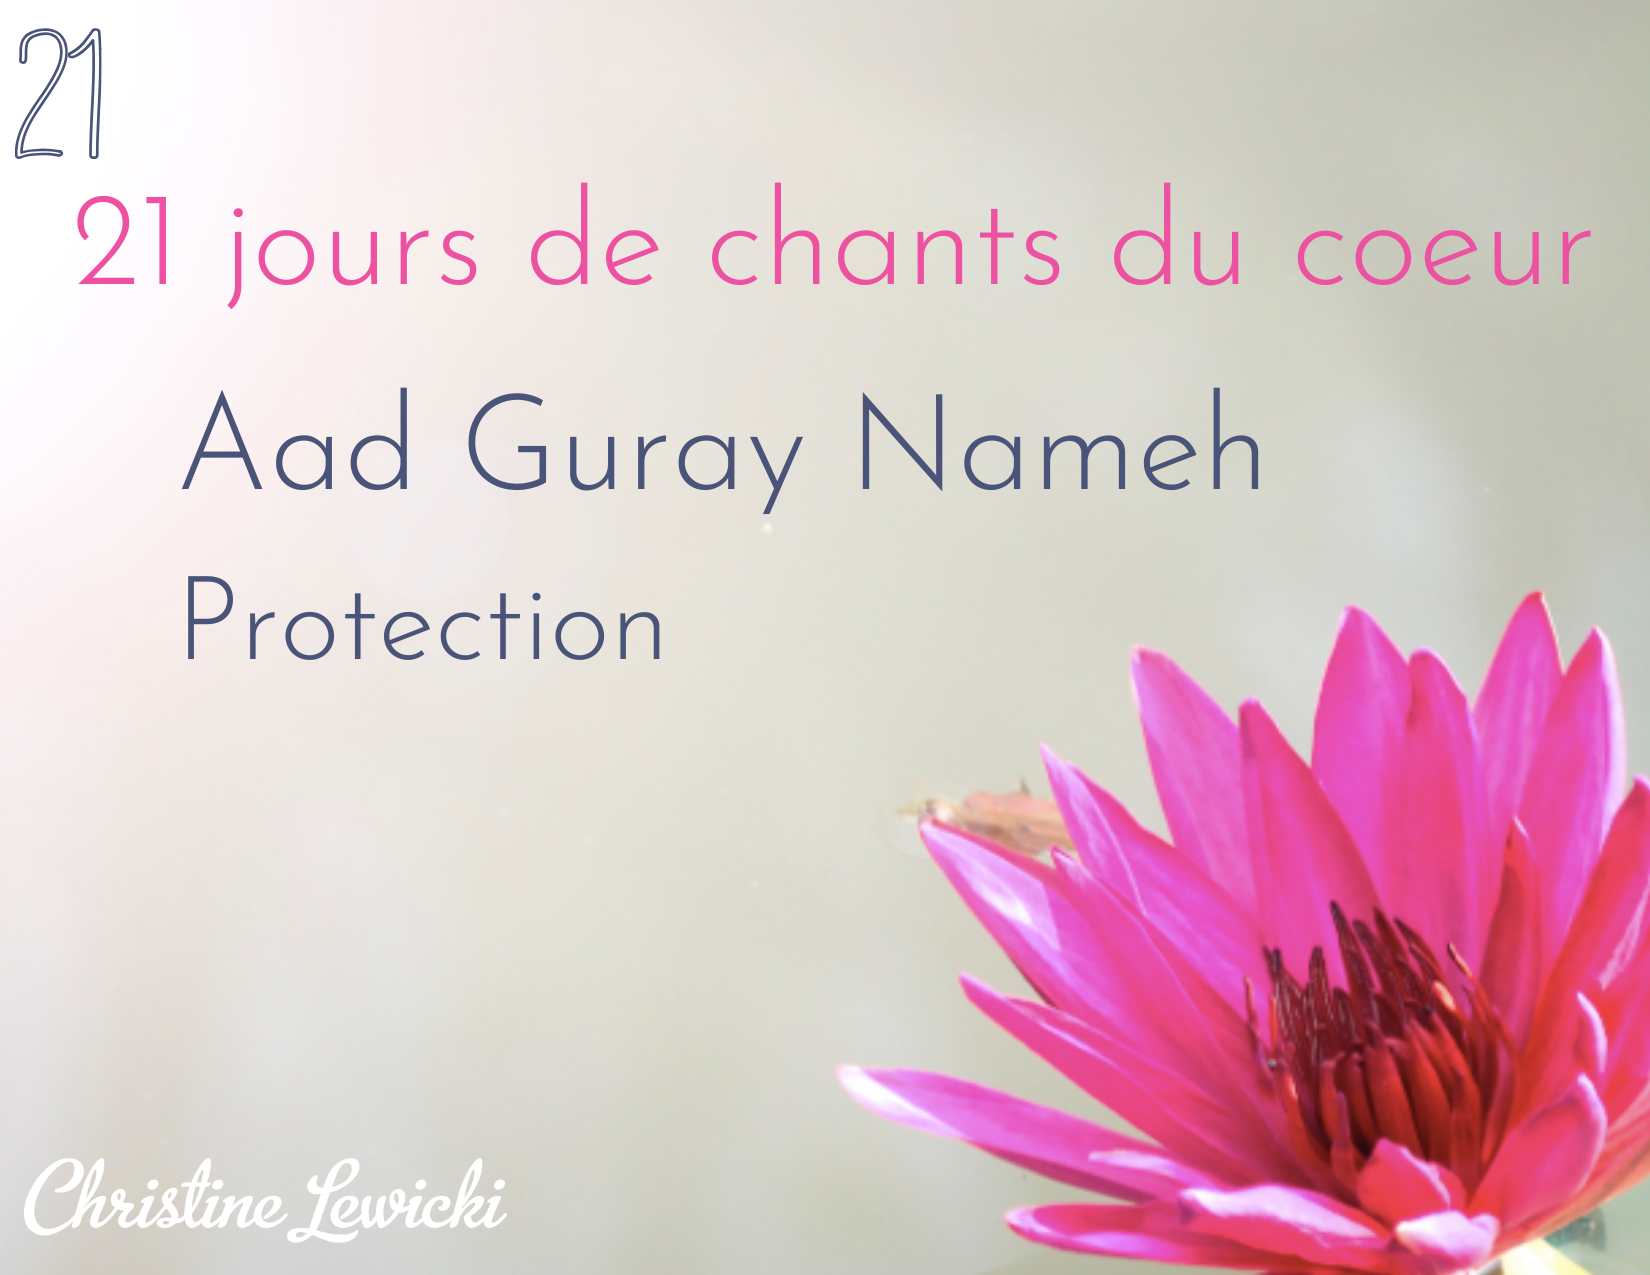 Aad Guray Nameh - protection